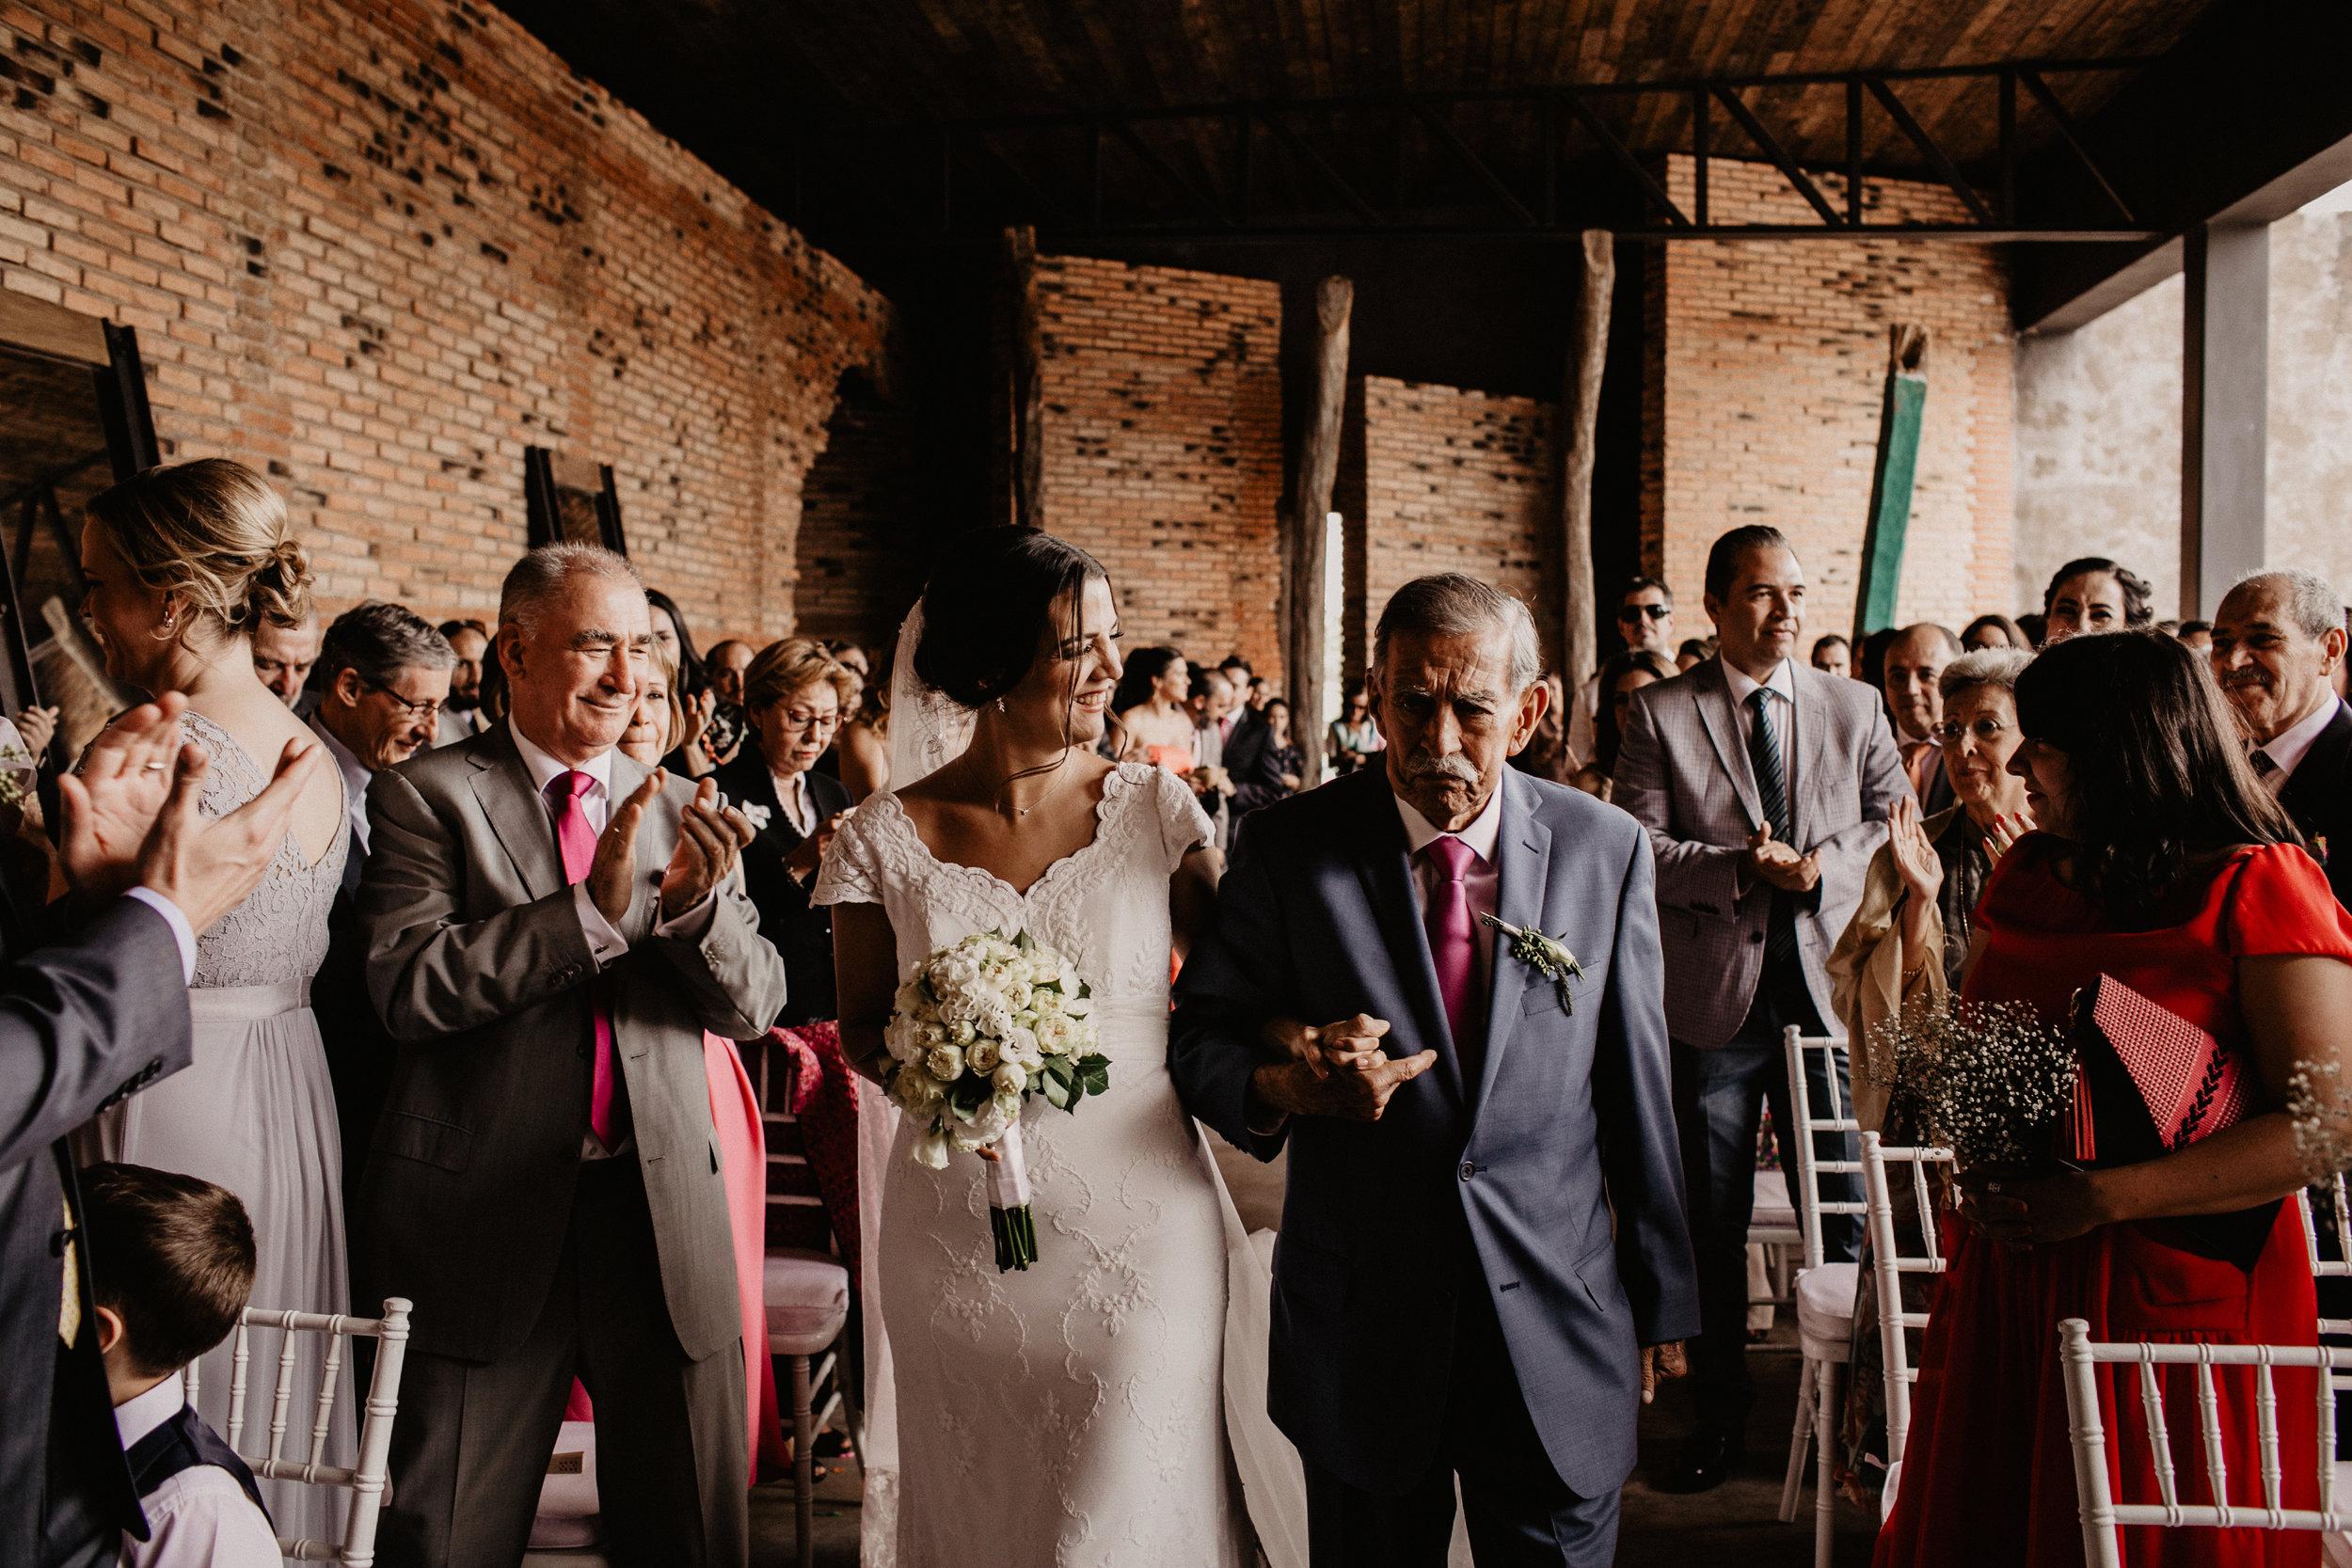 alfonso_flores_destination_wedding_photographer_pau_alonso_368.JPG